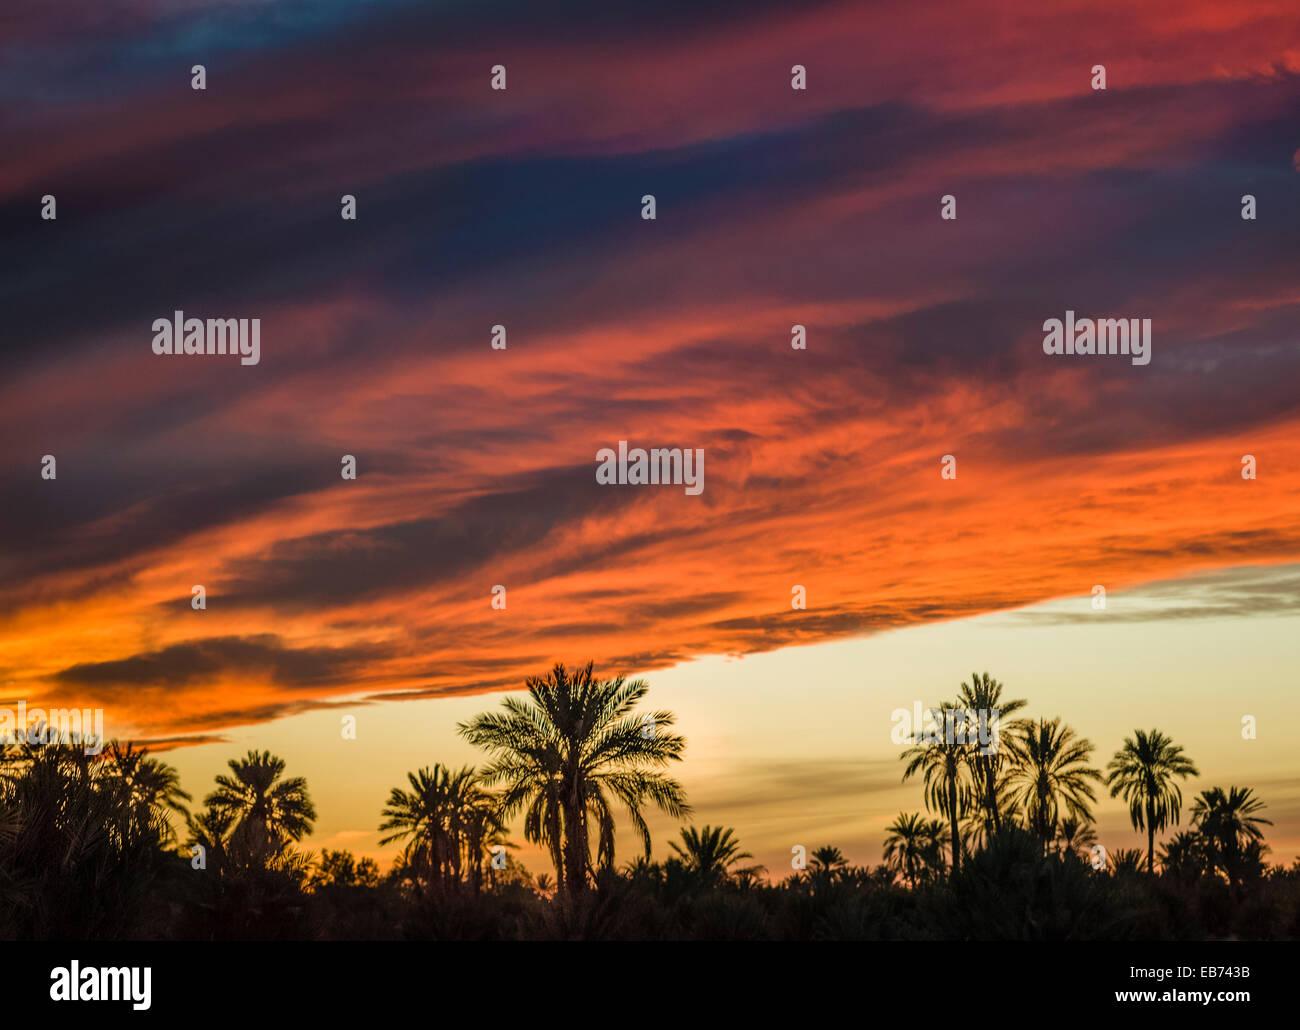 SUNSET TAFILALT PALM GROVE  RISSANI MOROCCO - Stock Image